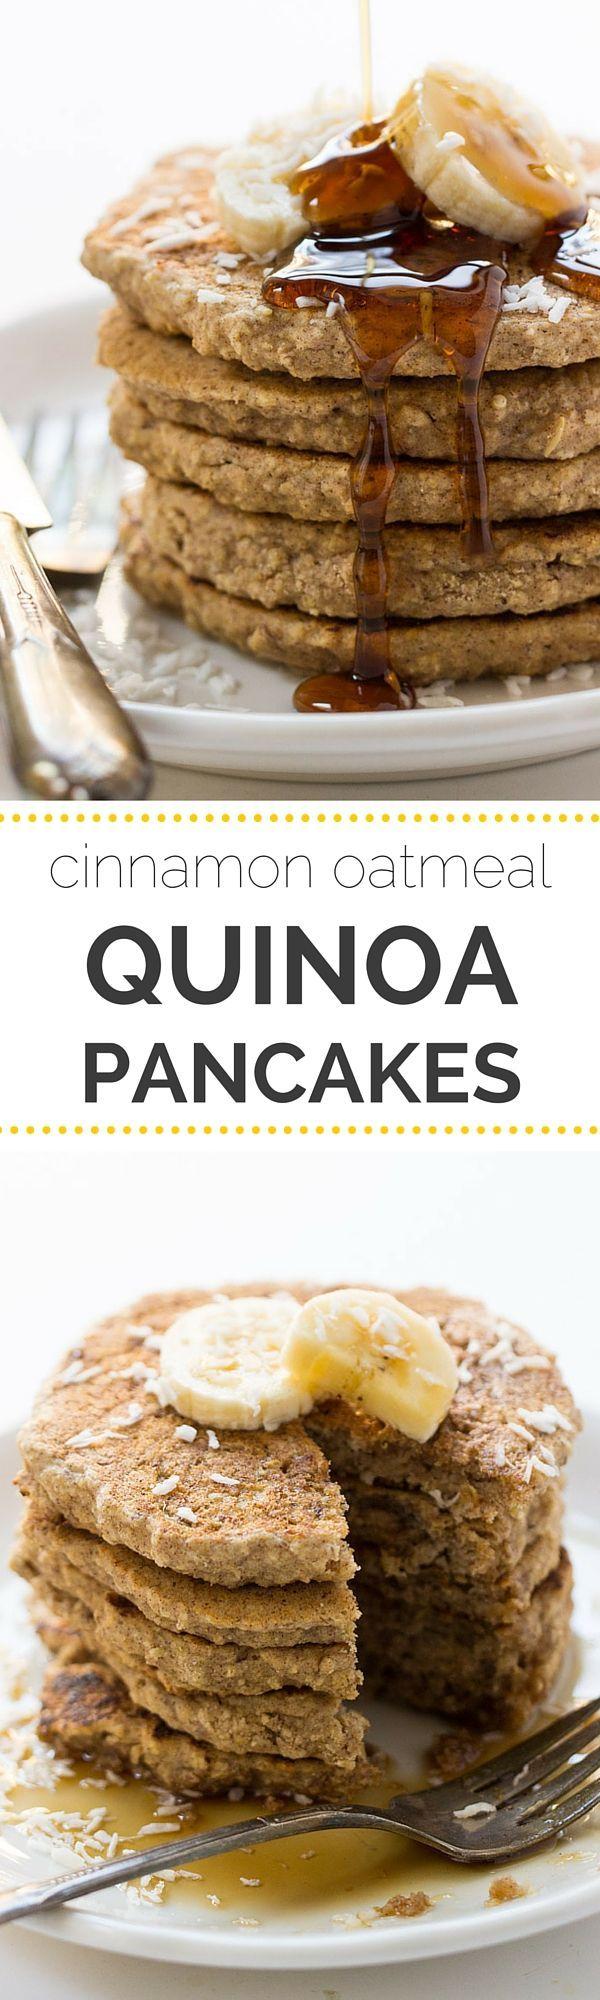 These HEALTHY quinoa pancakes are vegan, gluten-free and refined sugar free | recipe on simplyquinoa.com